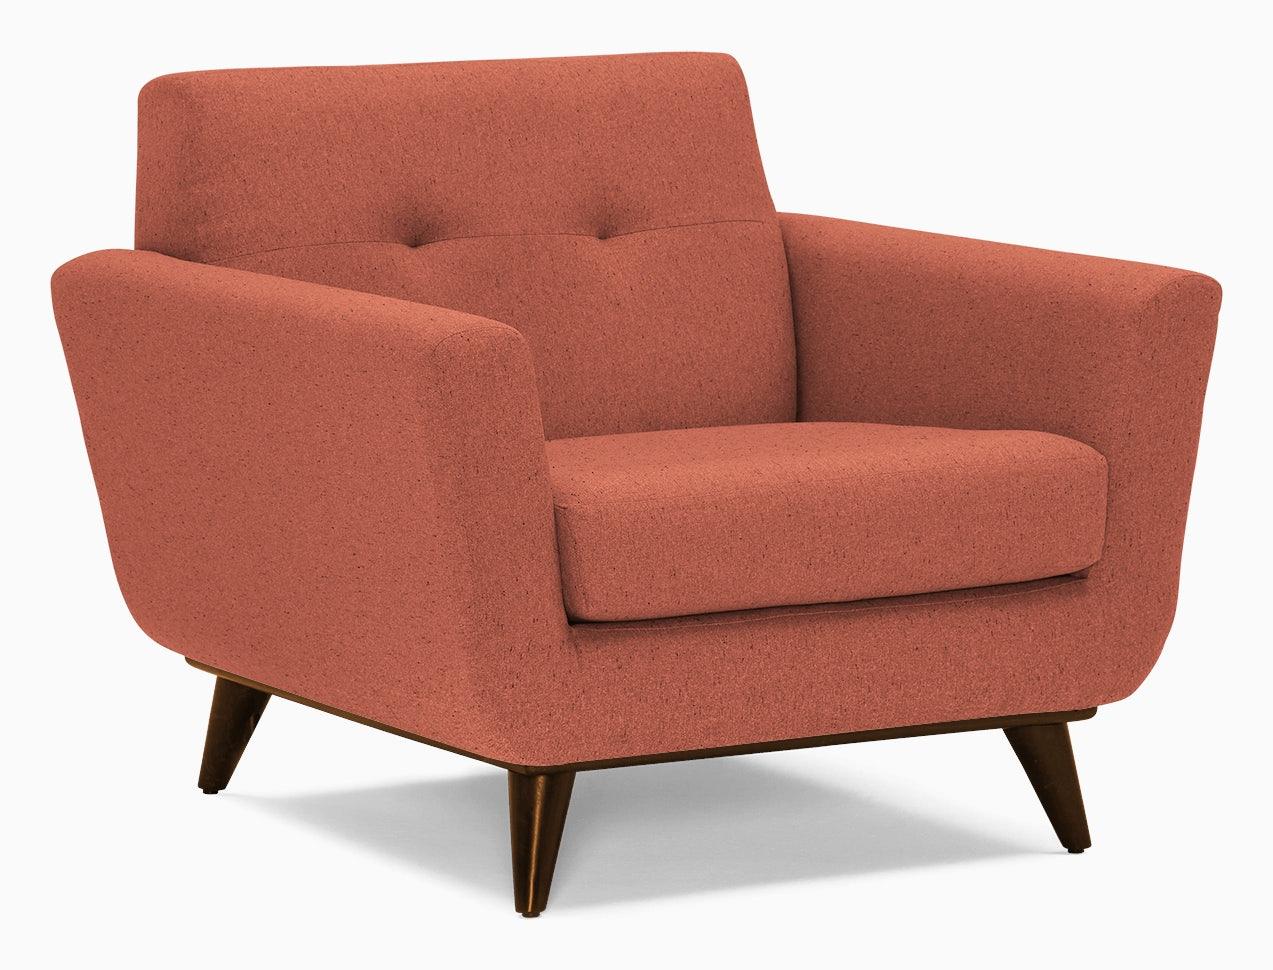 hughes chair key largo coral